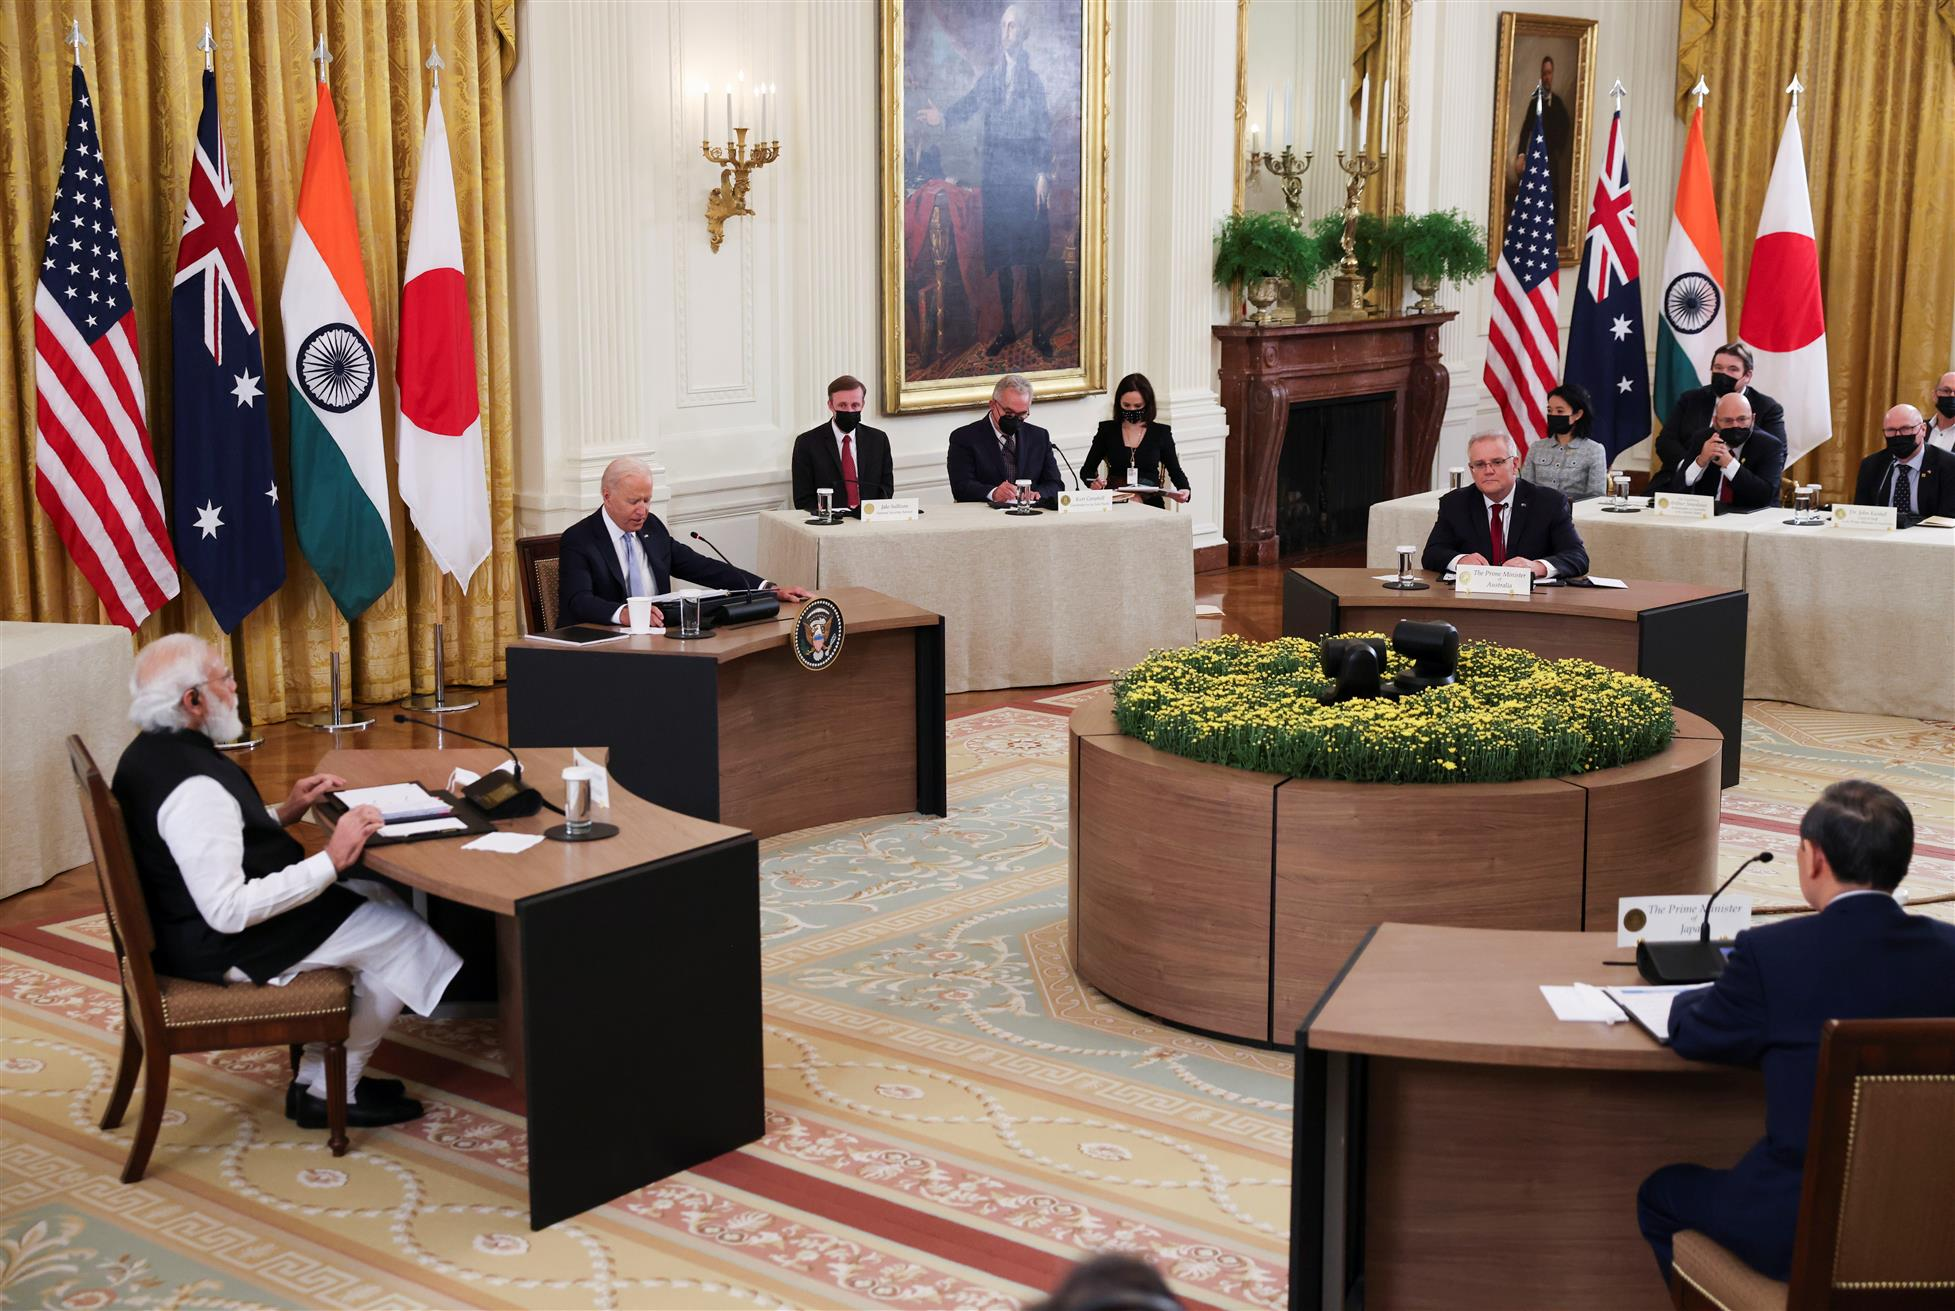 Quad A Force For Global Good: PM